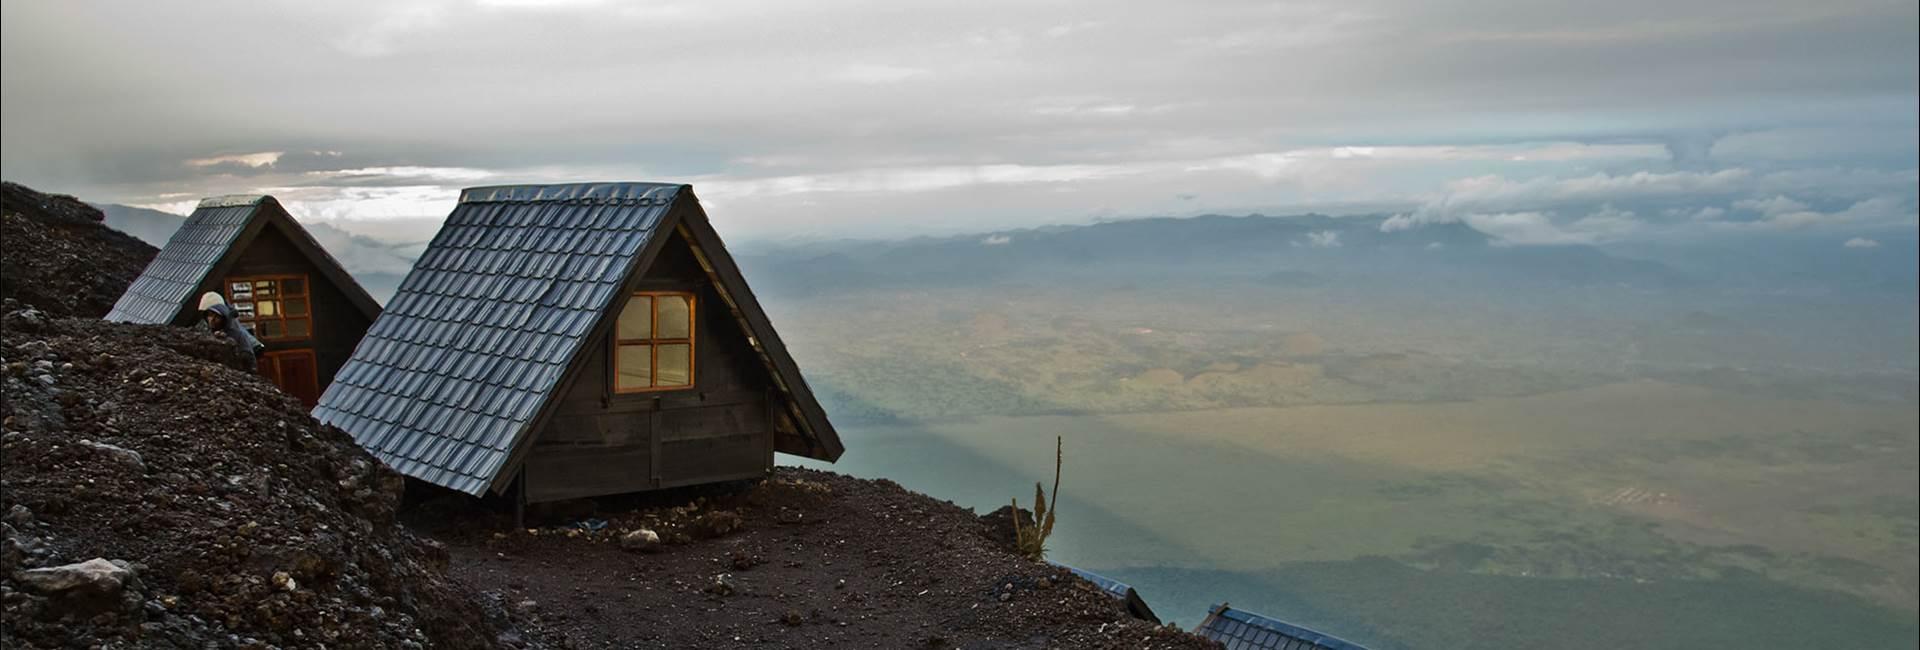 safari-in-rwanda-nyiragongo-vulkaan_04